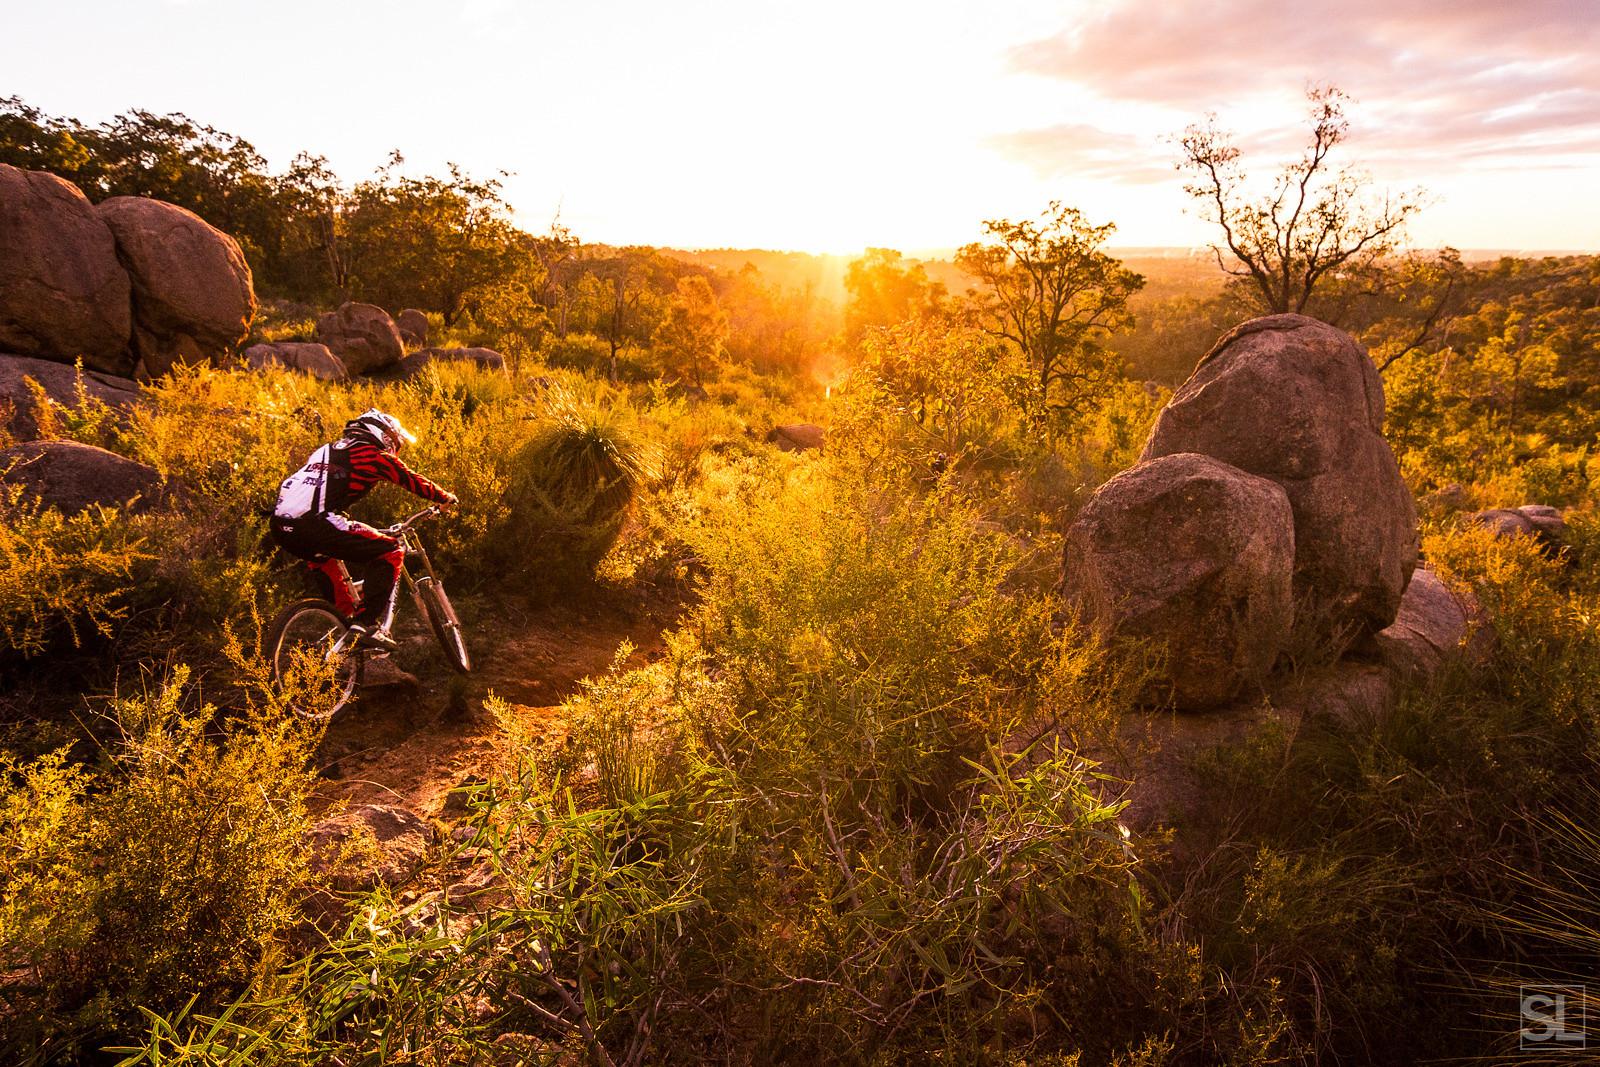 Shredding into the sunset - Chamakazi - Mountain Biking Pictures - Vital MTB